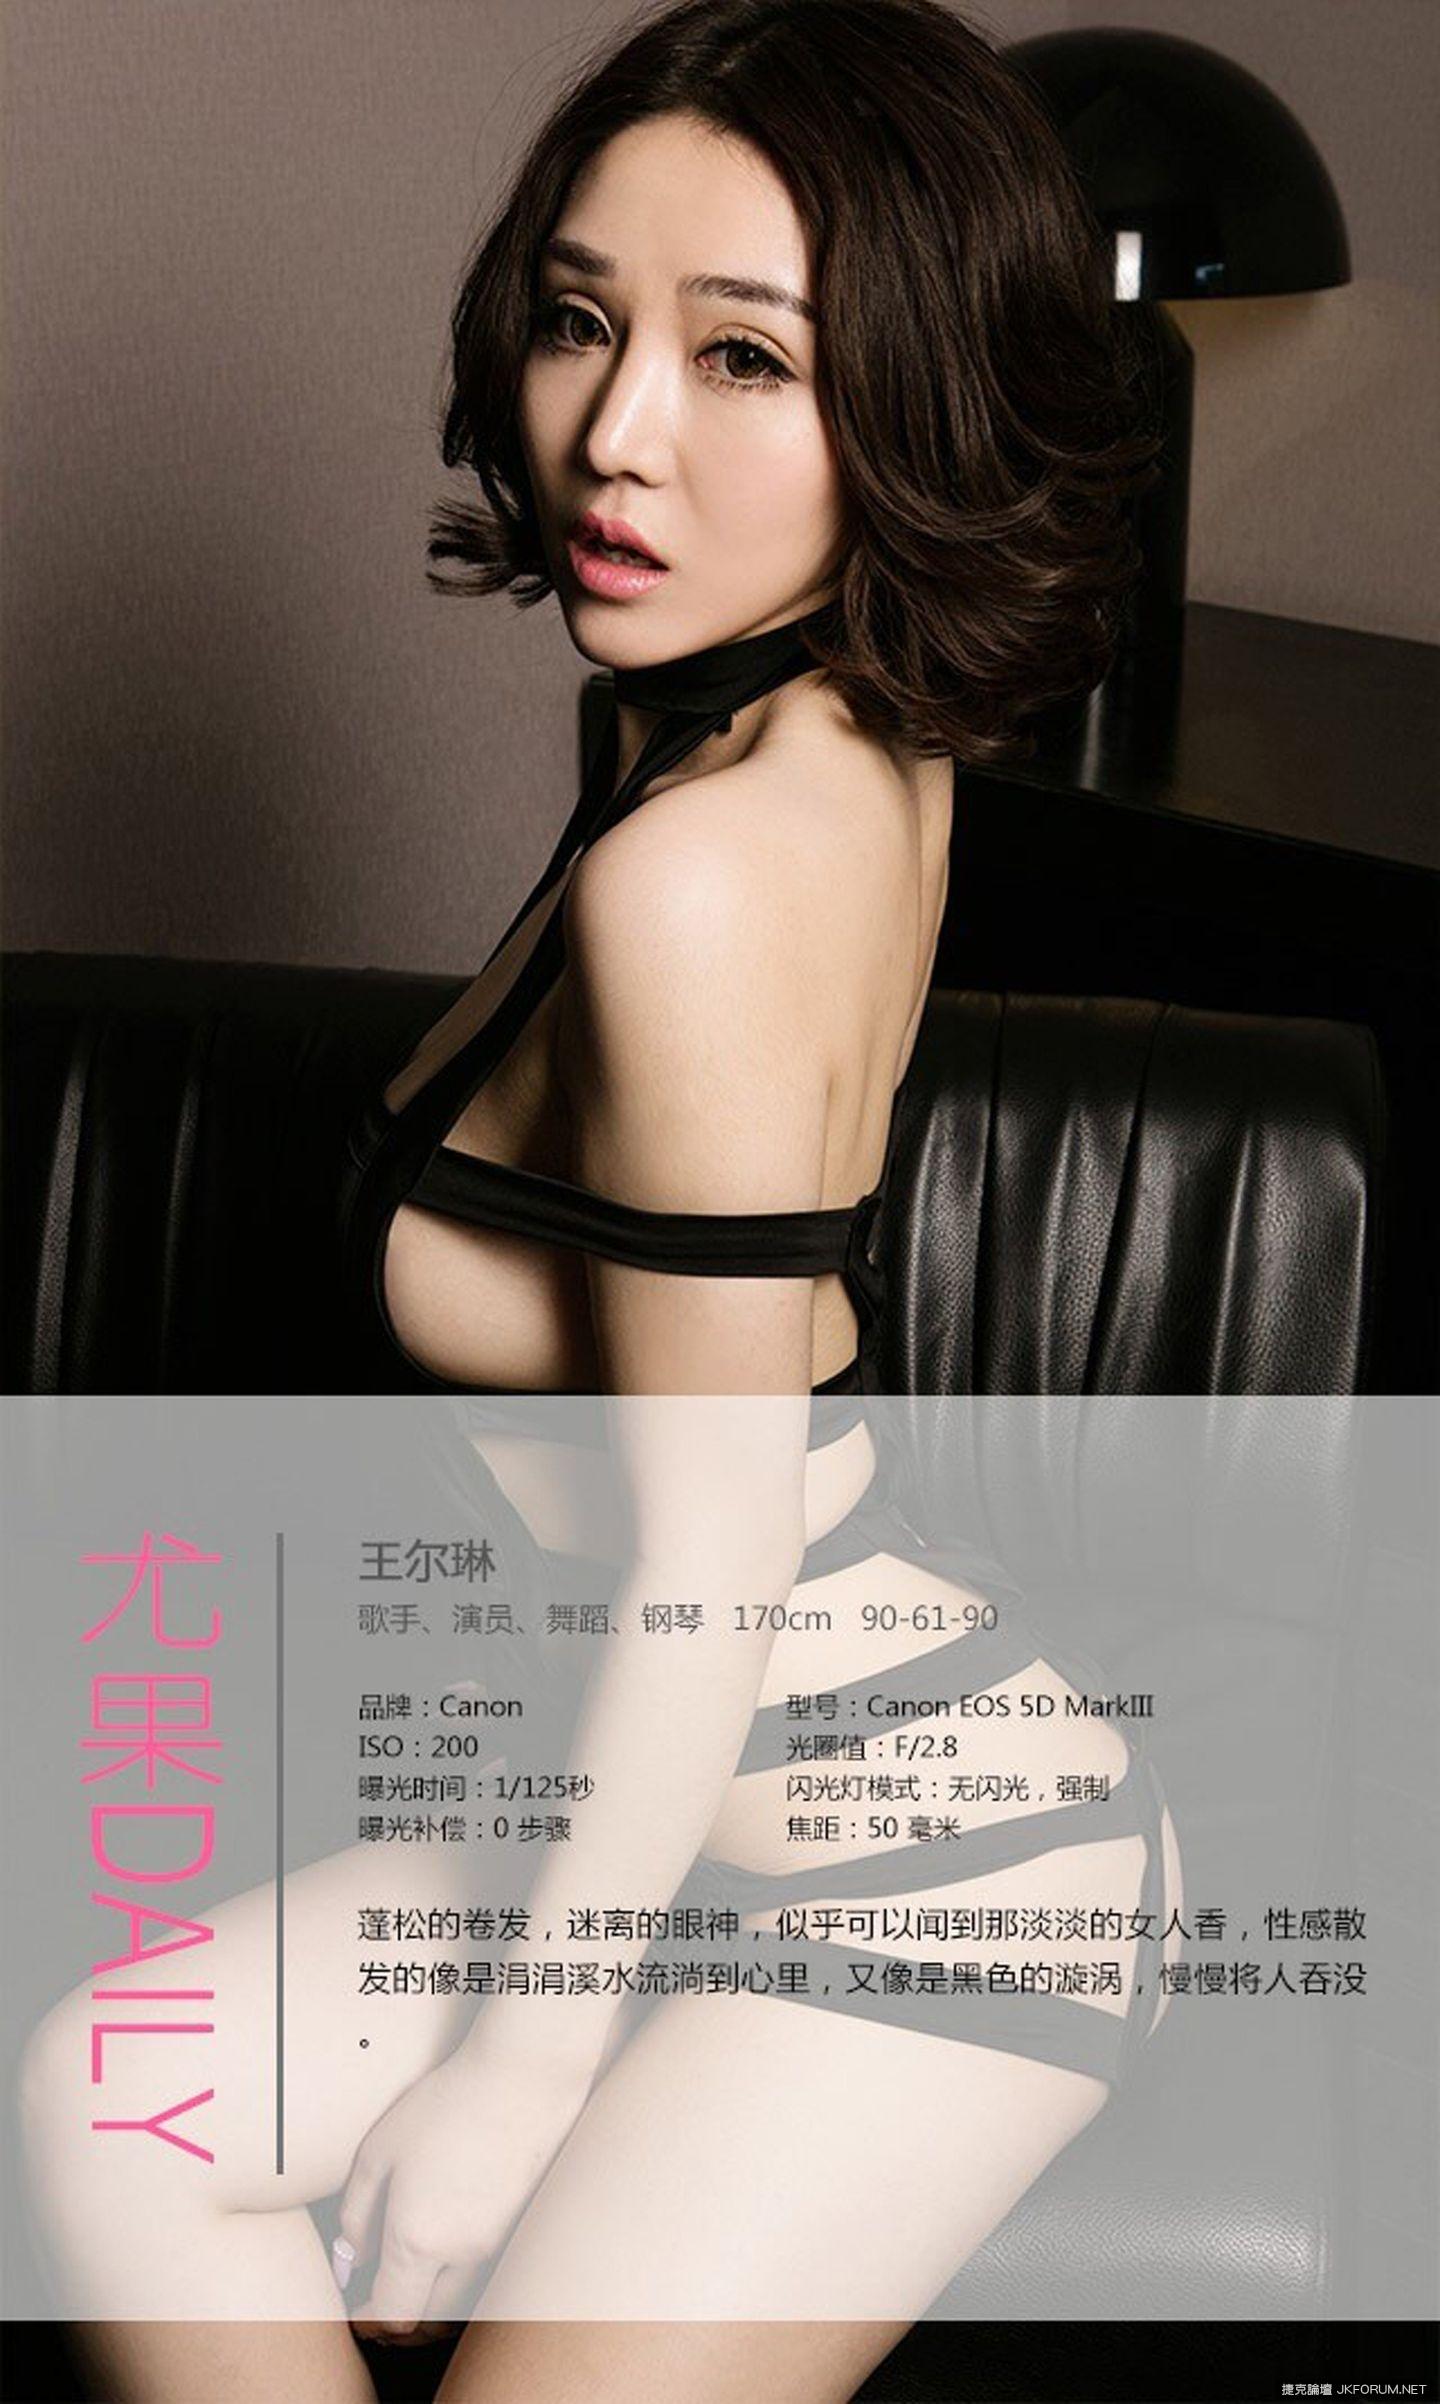 【Ugirls愛尤物系列】APP2015 No.239 Sexy Queen 王爾琳【36P】 - 貼圖 - 絲襪美腿 -